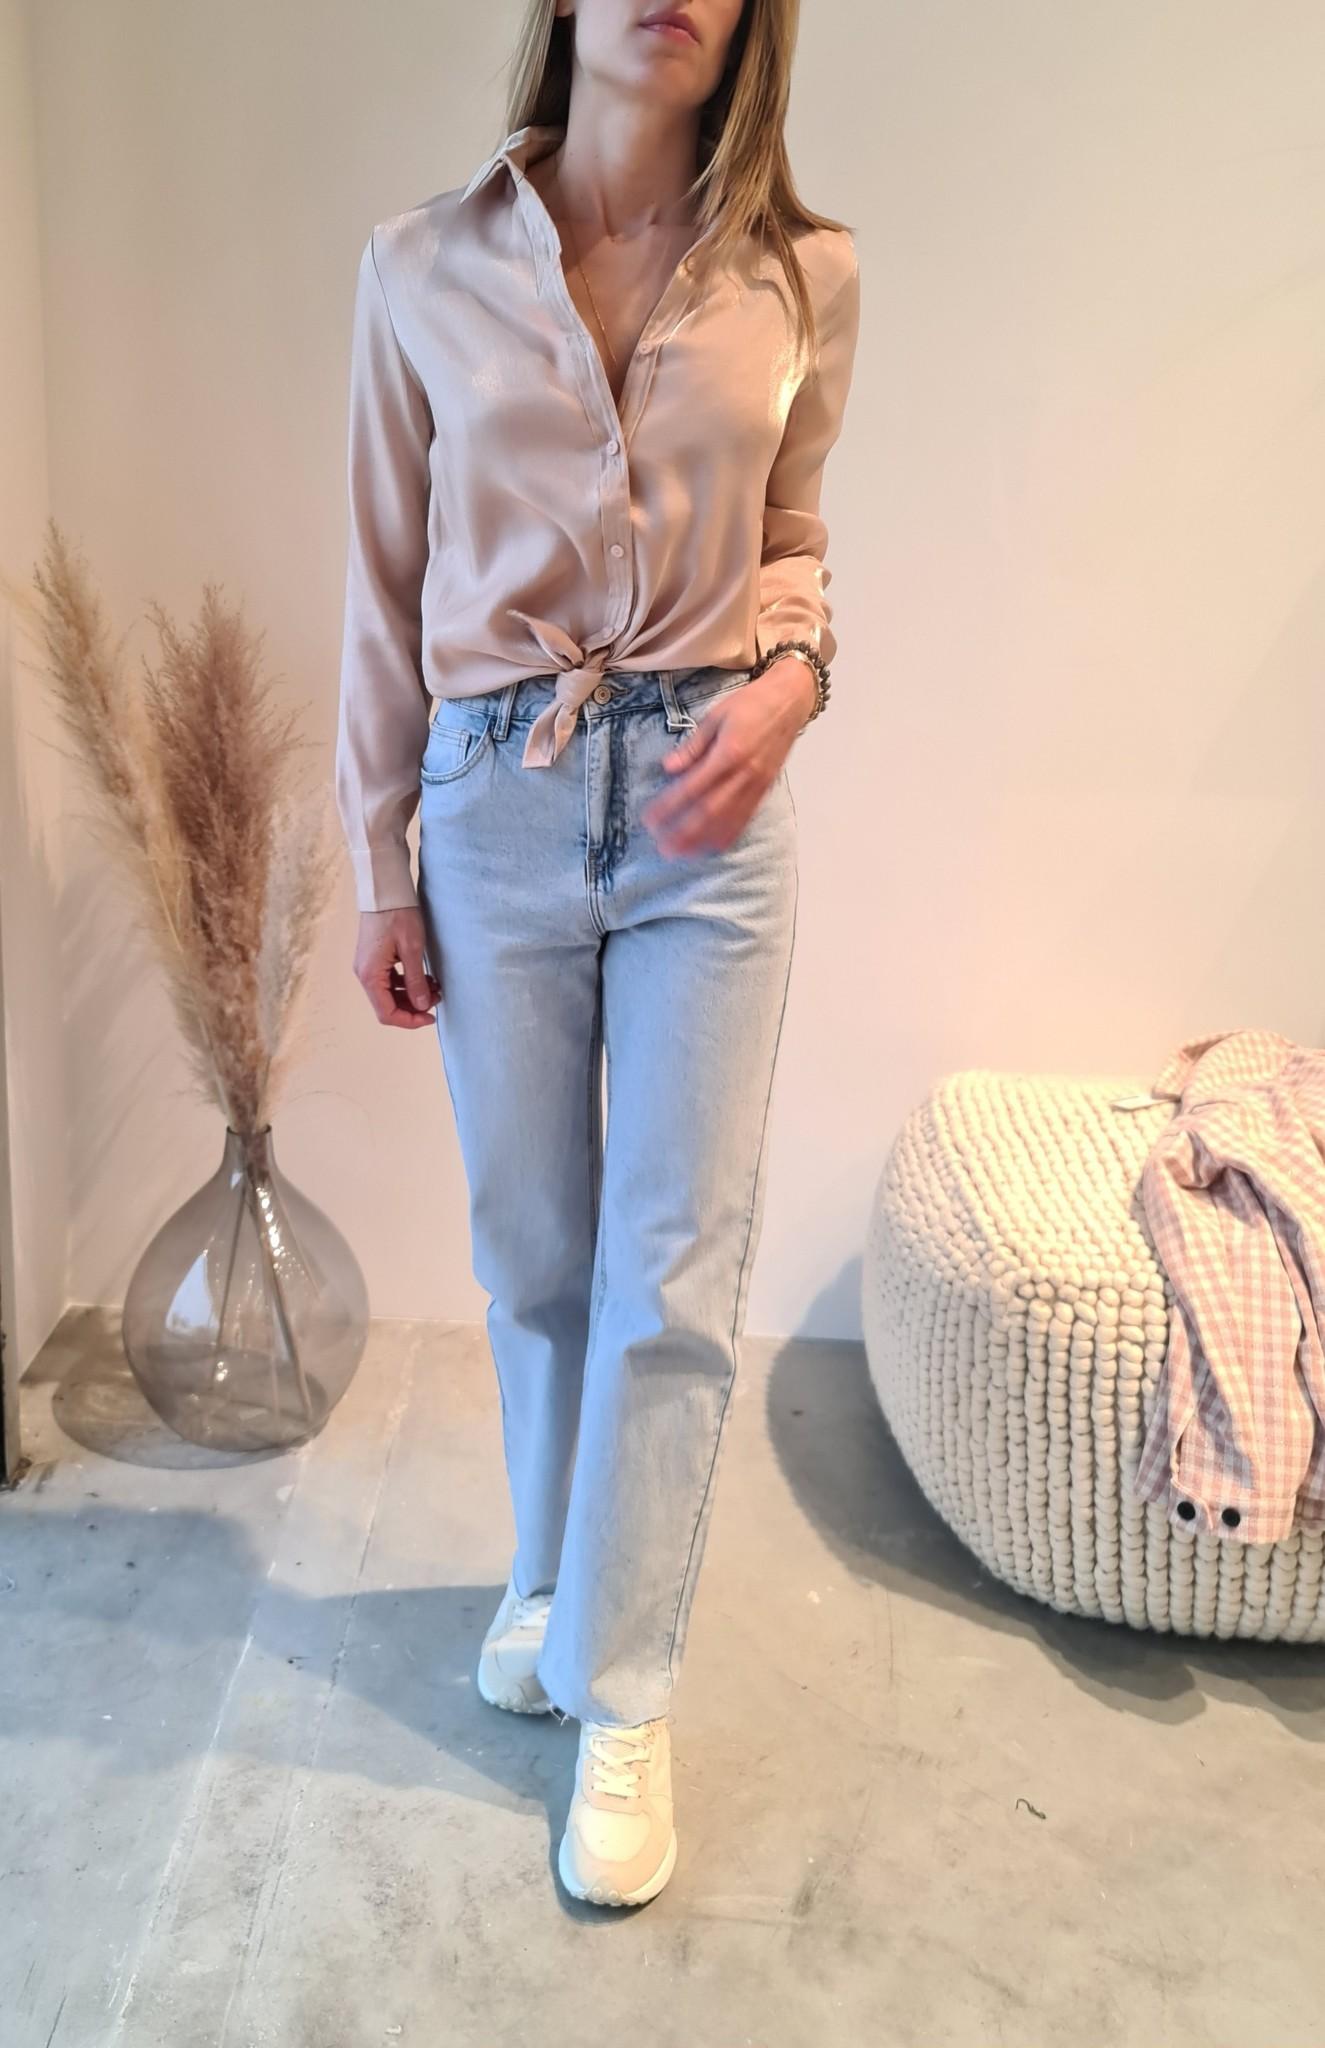 SYBLINE chemise-2